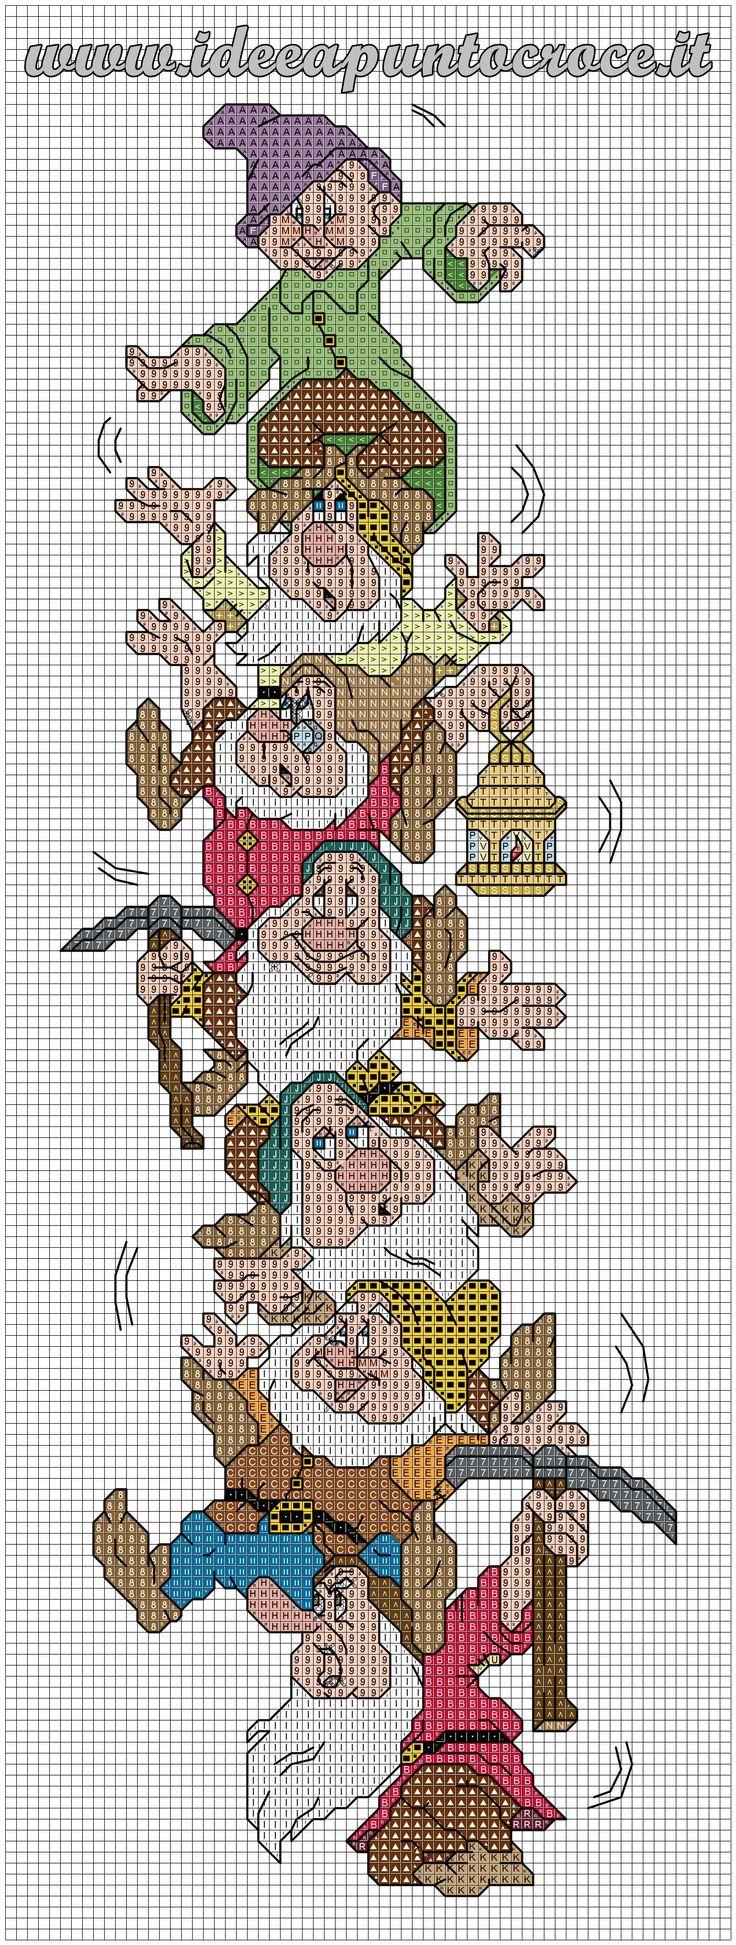 Seven dwarfs More